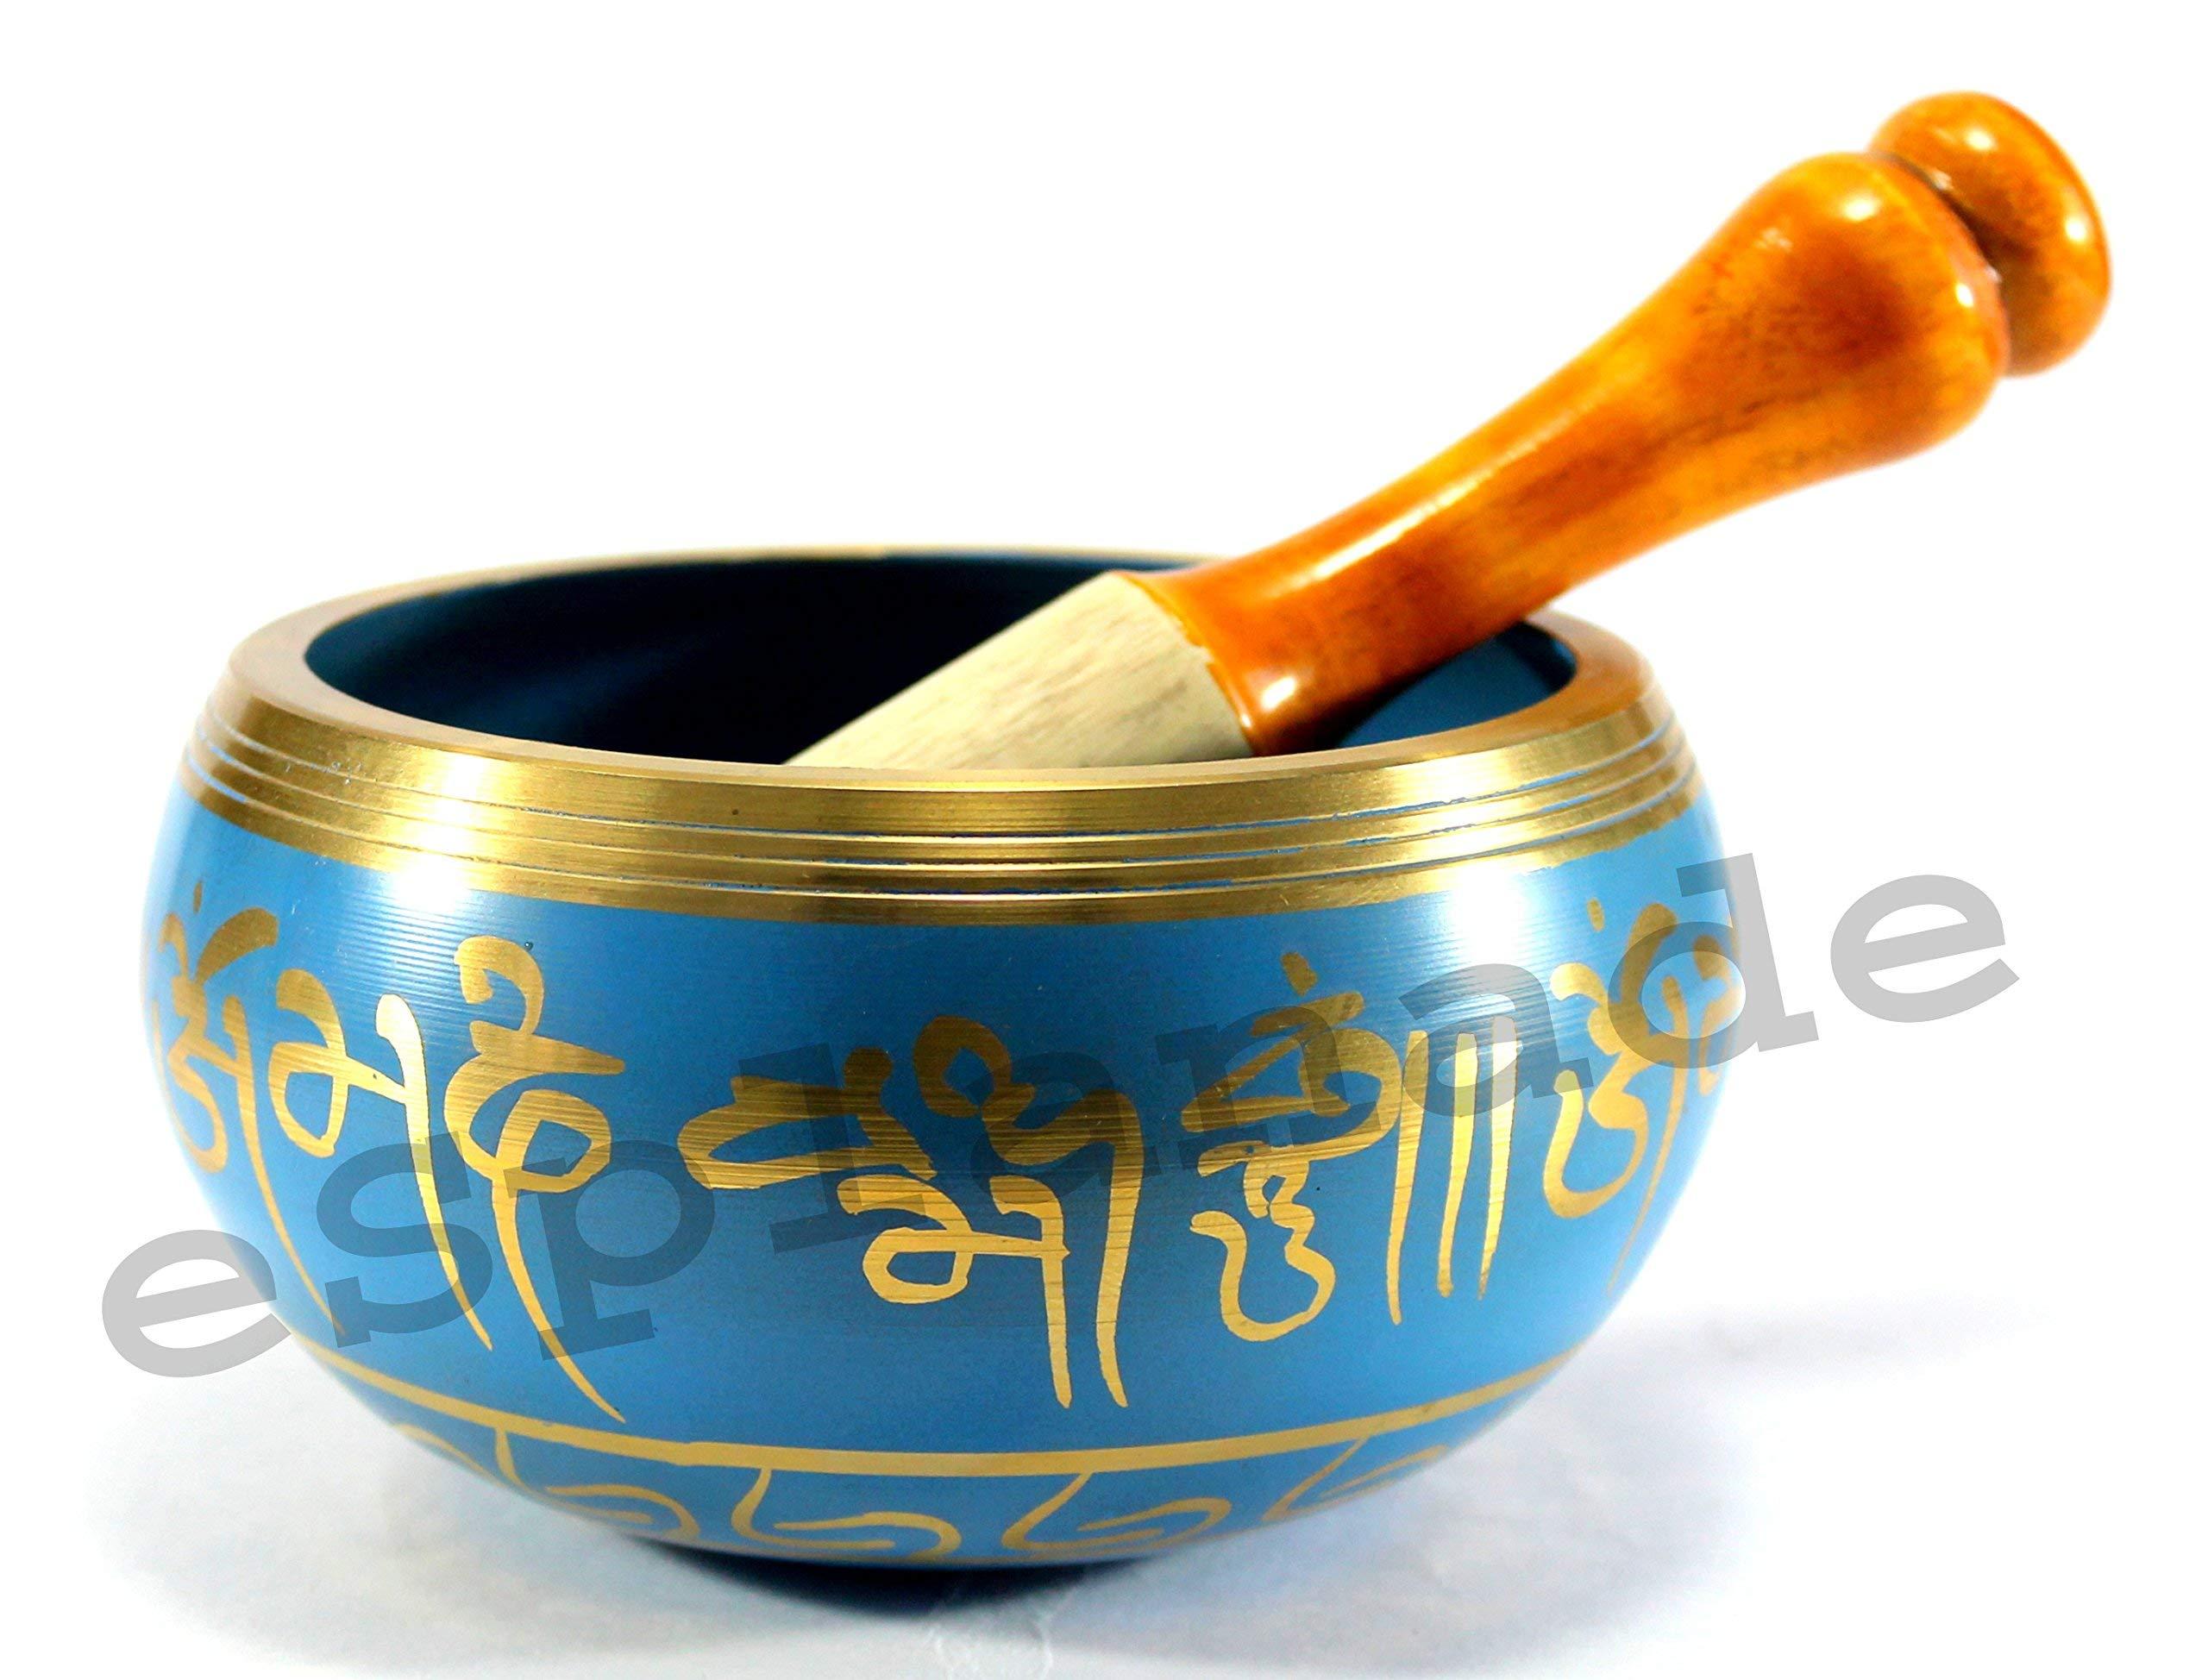 eSplanade - 5 inches - Singing Bowl Tibetan Buddhist Prayer Instrument With Striker Stick | OM Bell | OM Bowl | Meditation Bowl | Music Therapy by eSplanade